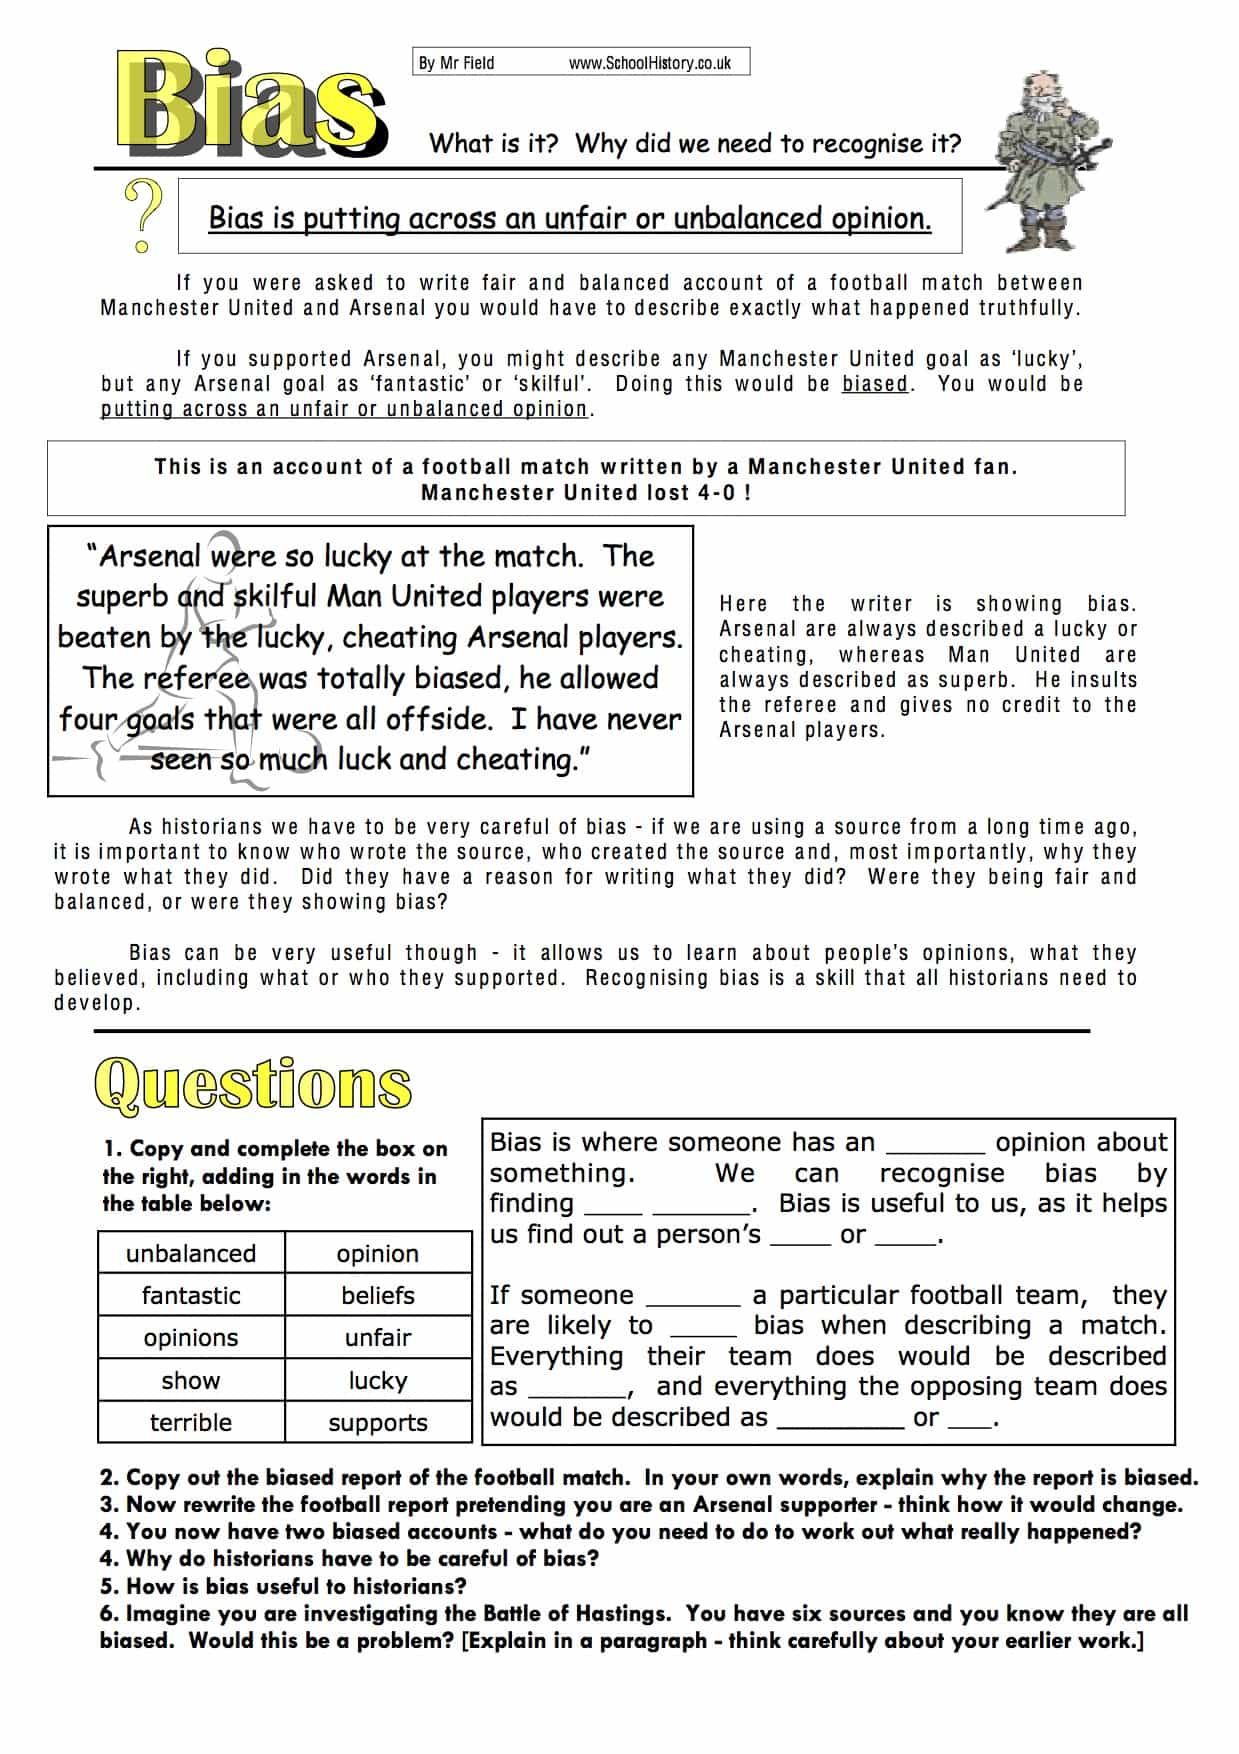 Understanding Bias Study Worksheet